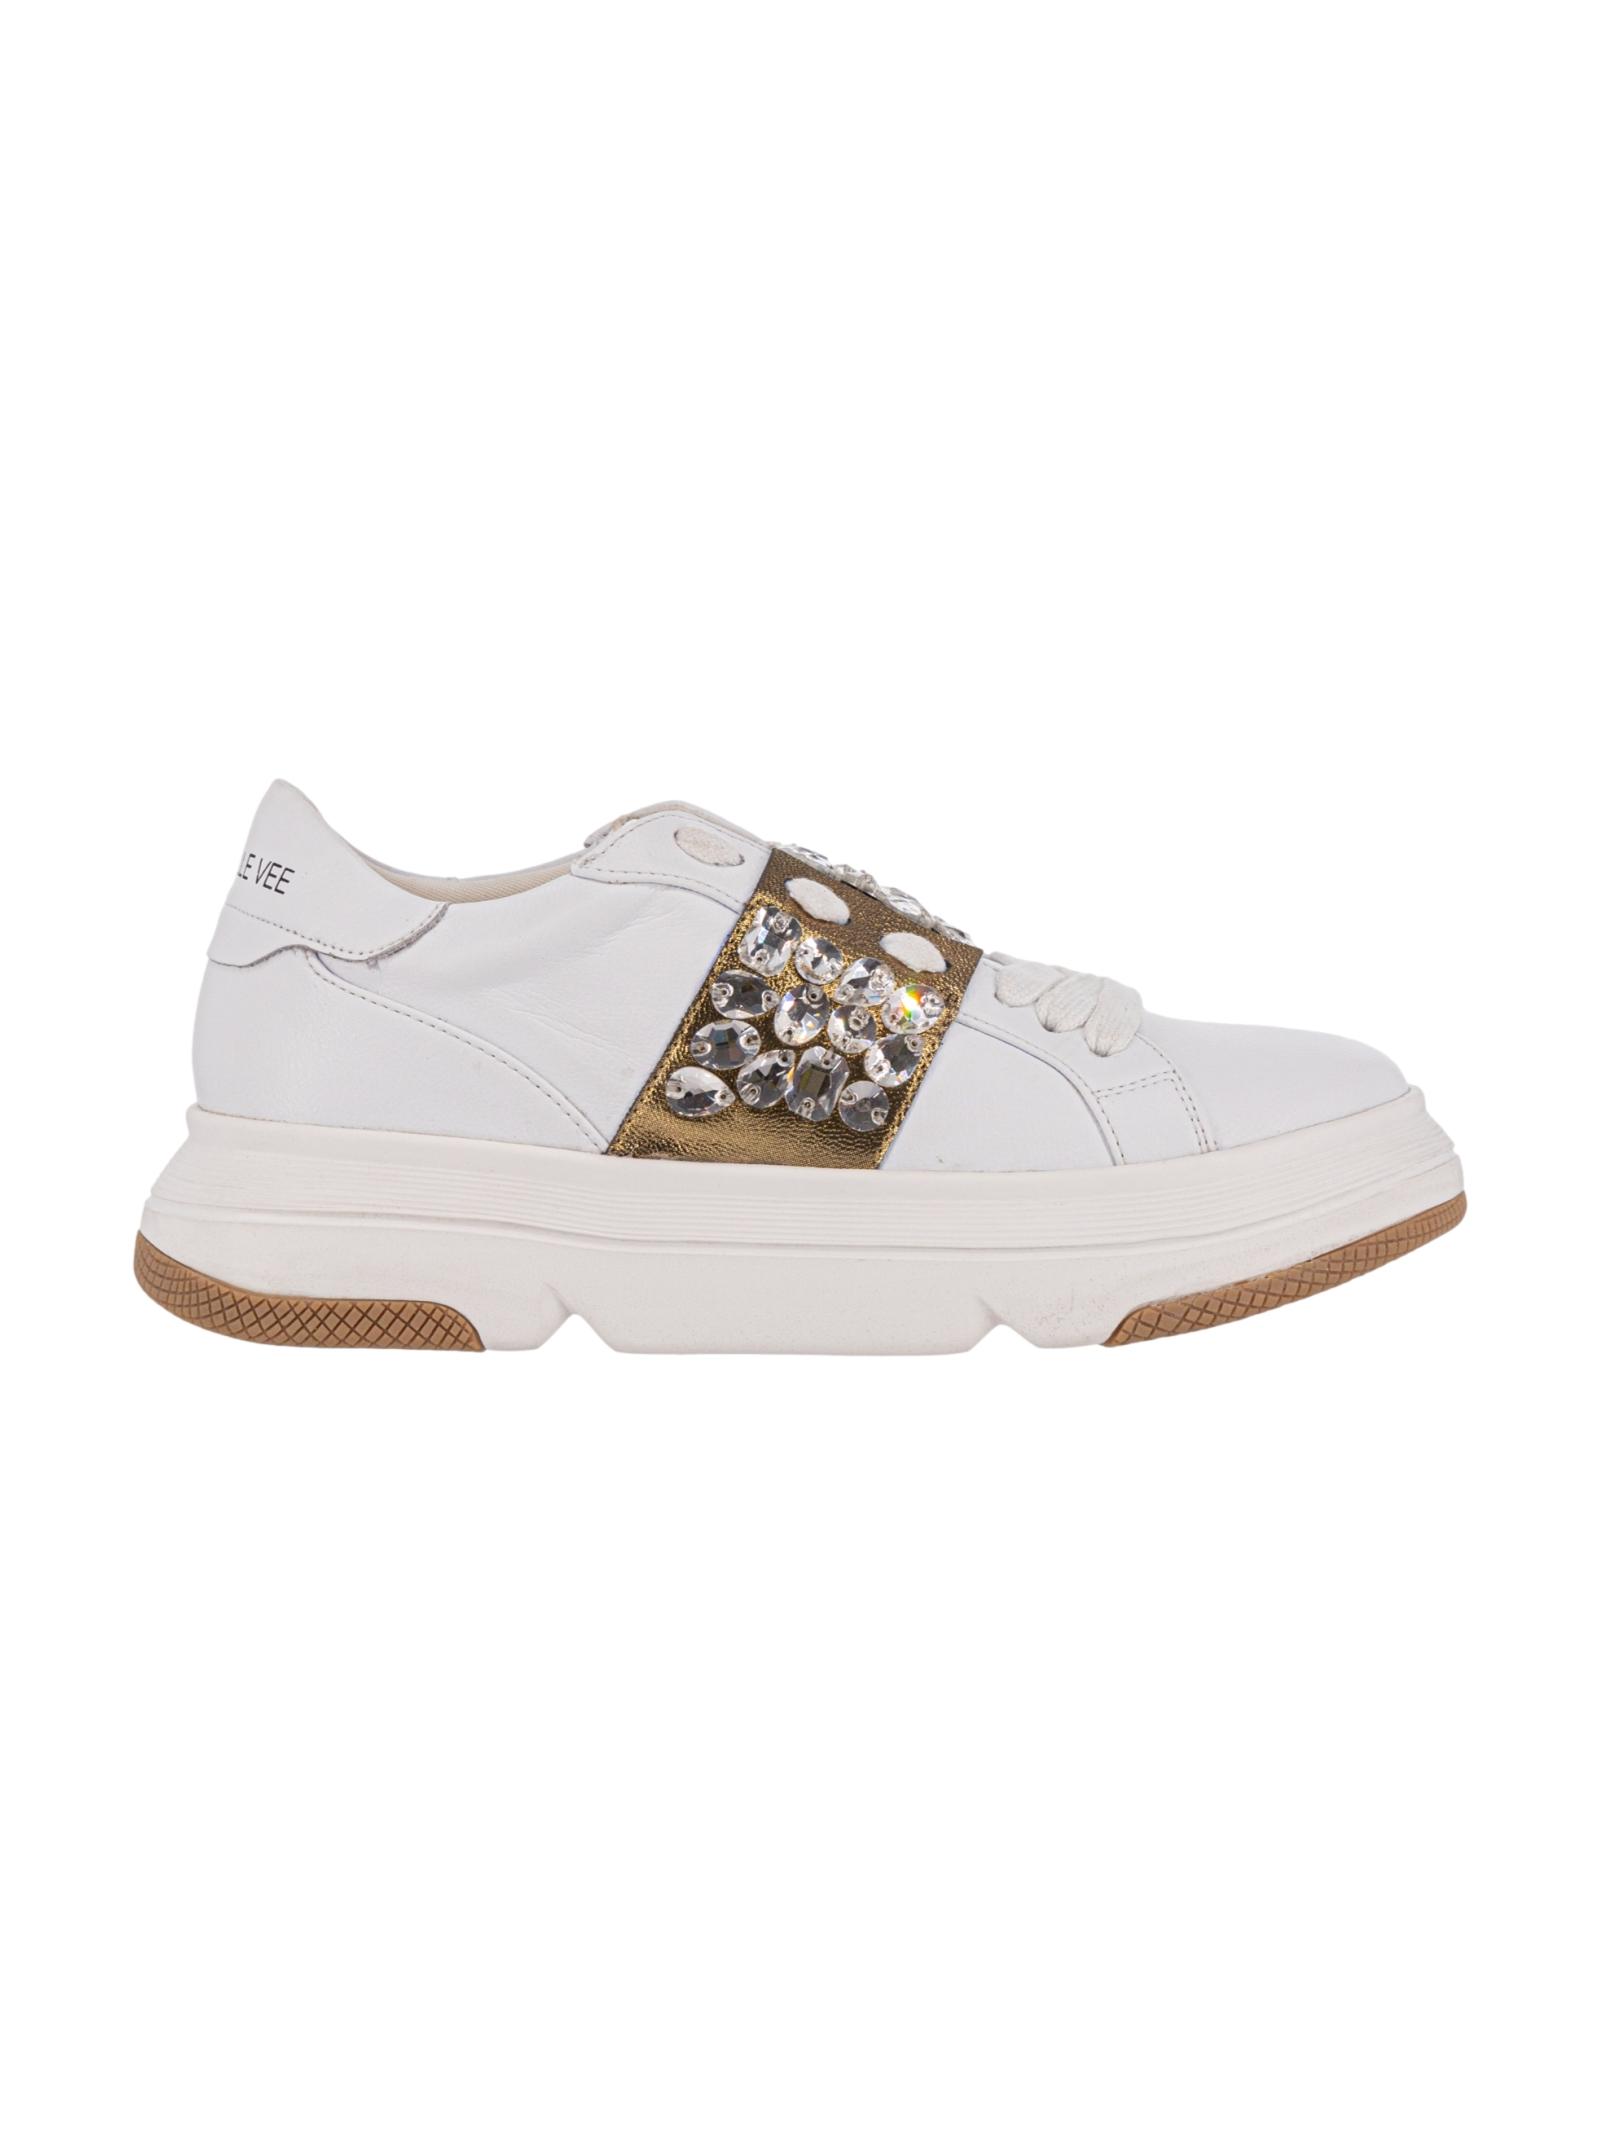 Emanuelle Vee Sneakers Bianche/Gold